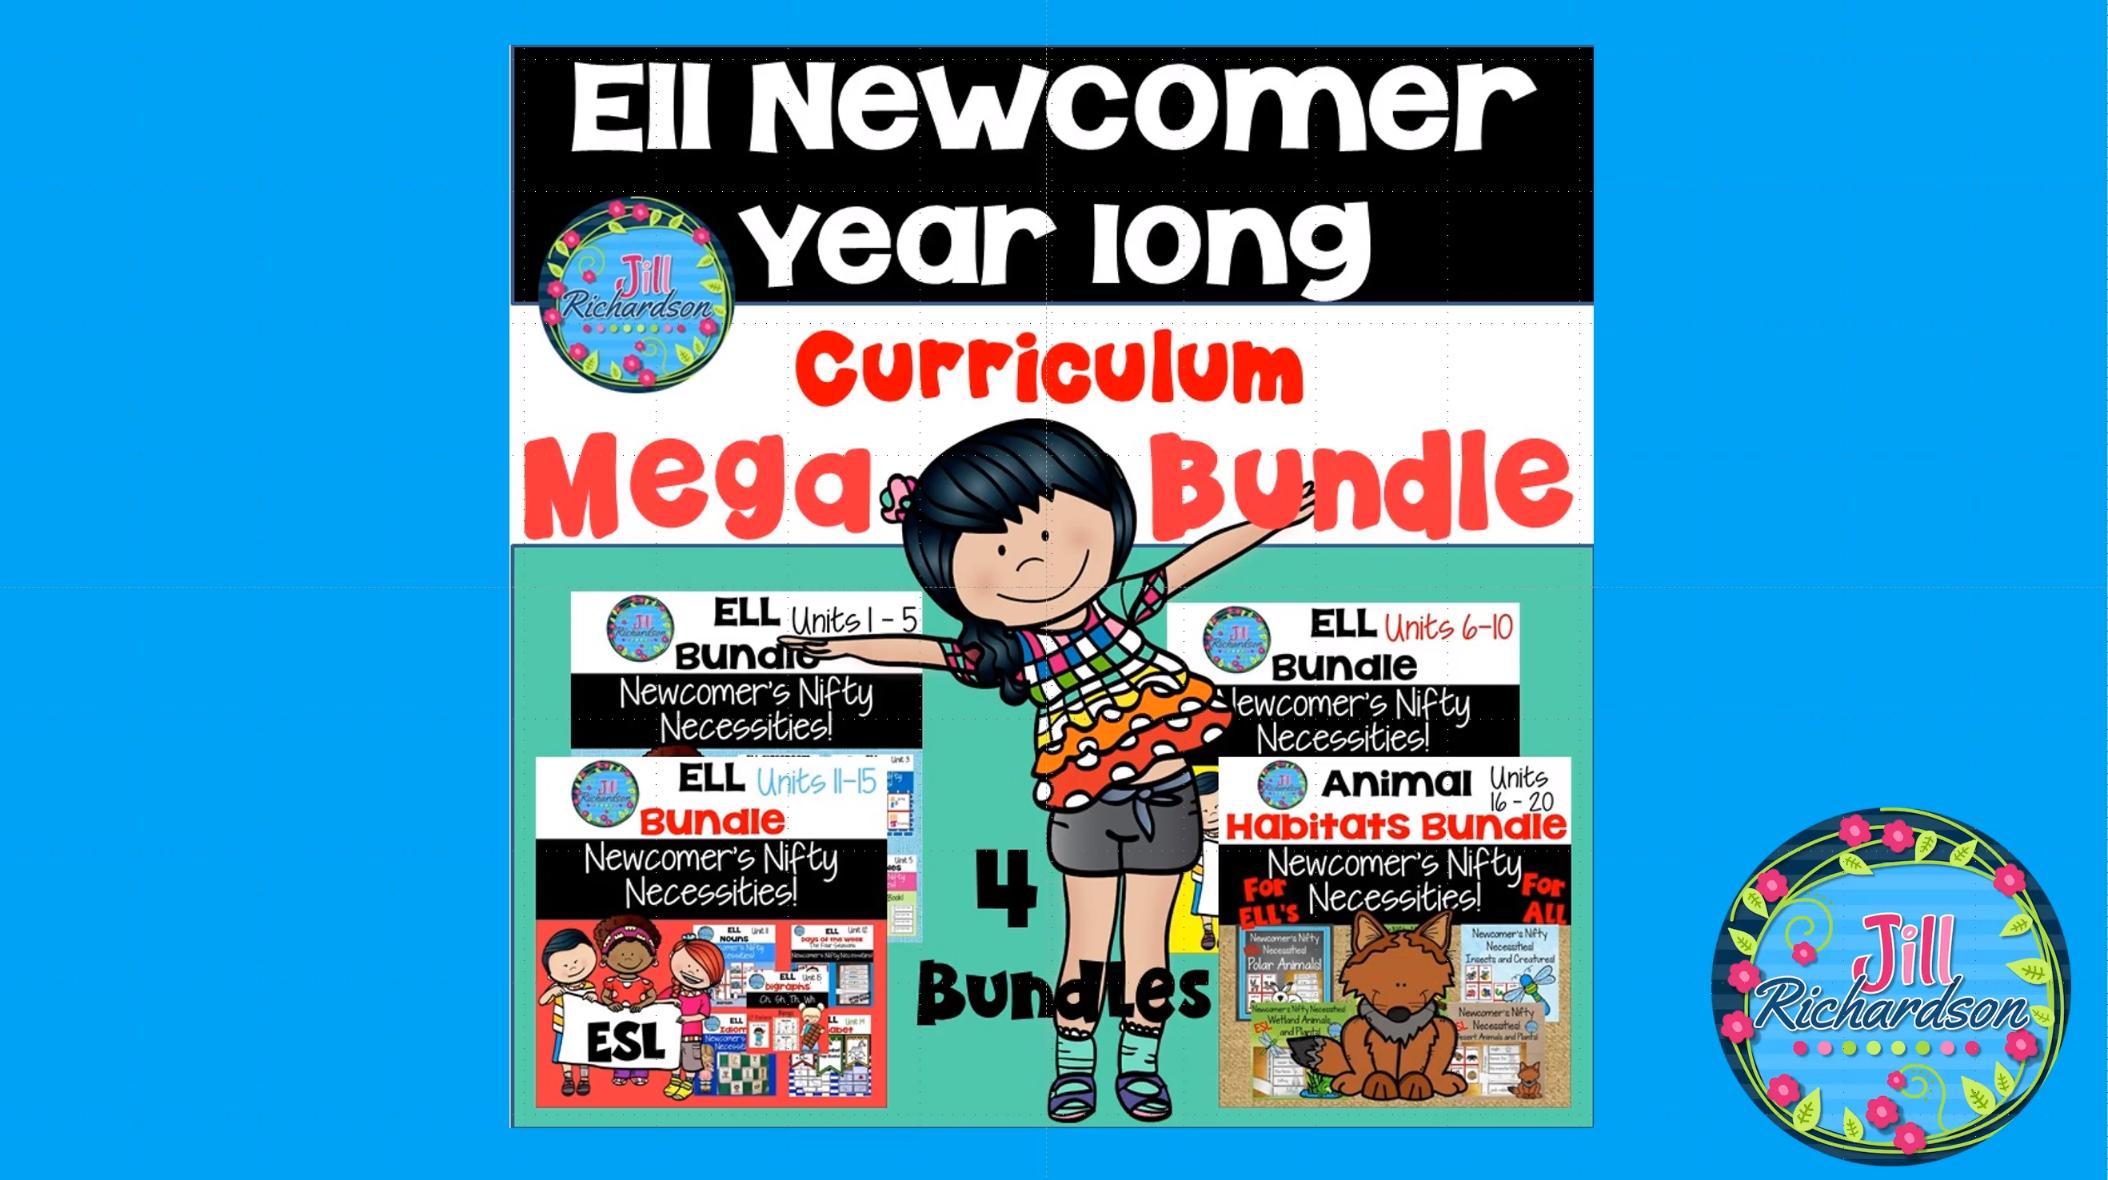 ell newcomer u2019s curriculum  u2013 20 units esl activities mega bundle  do you need help when a new